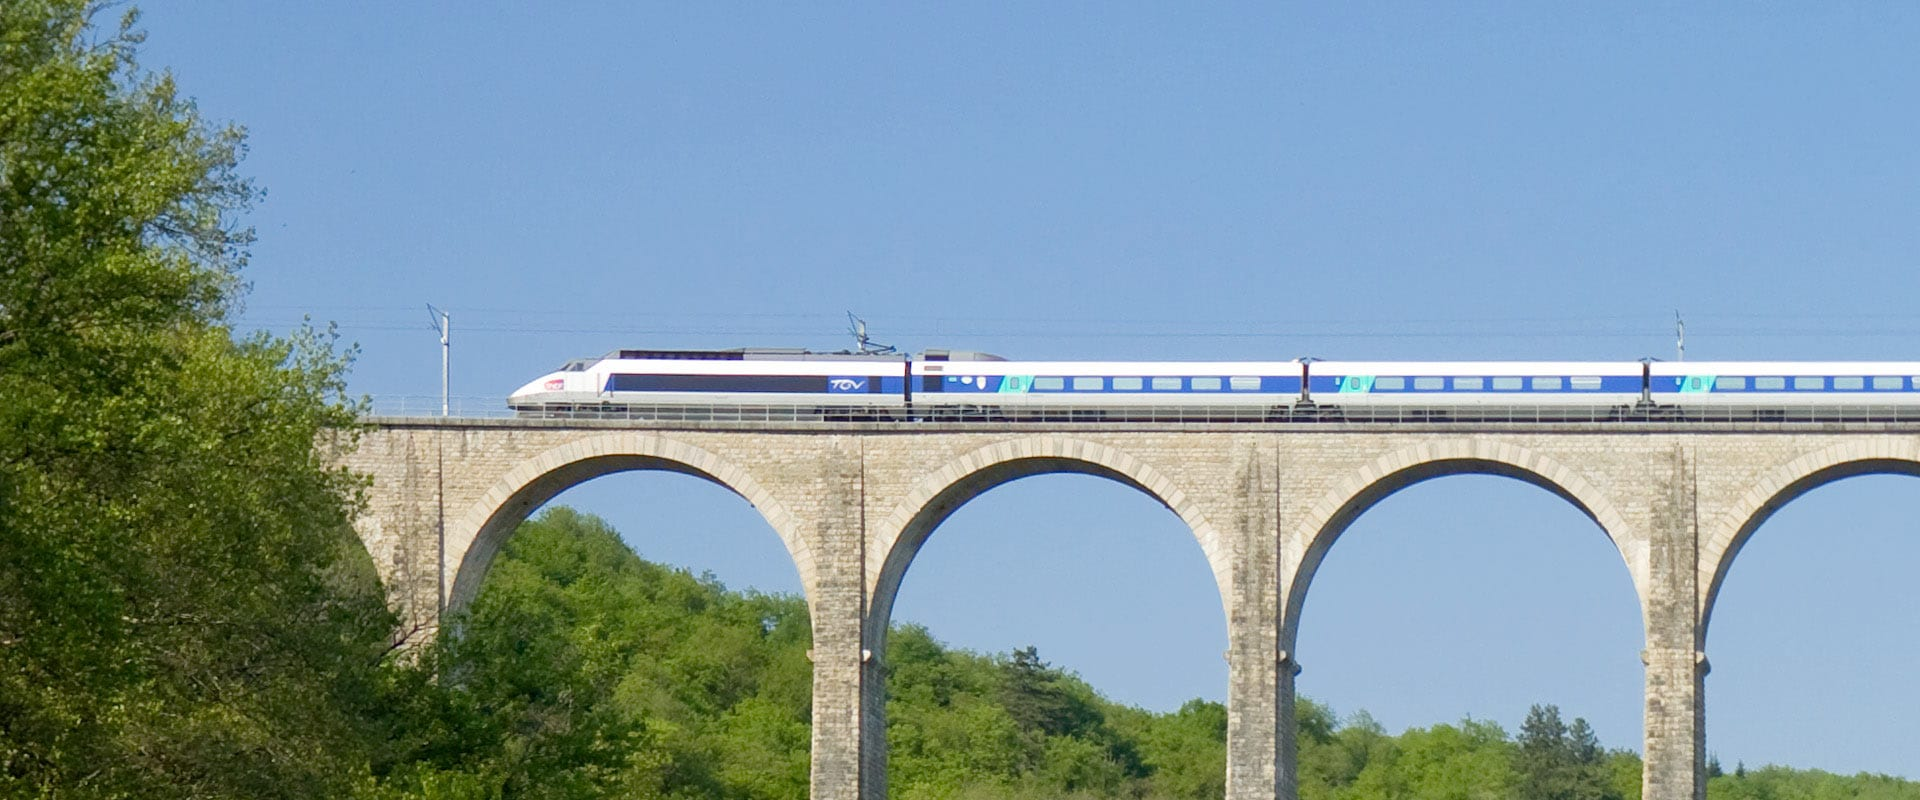 Passe de Trem na Europa